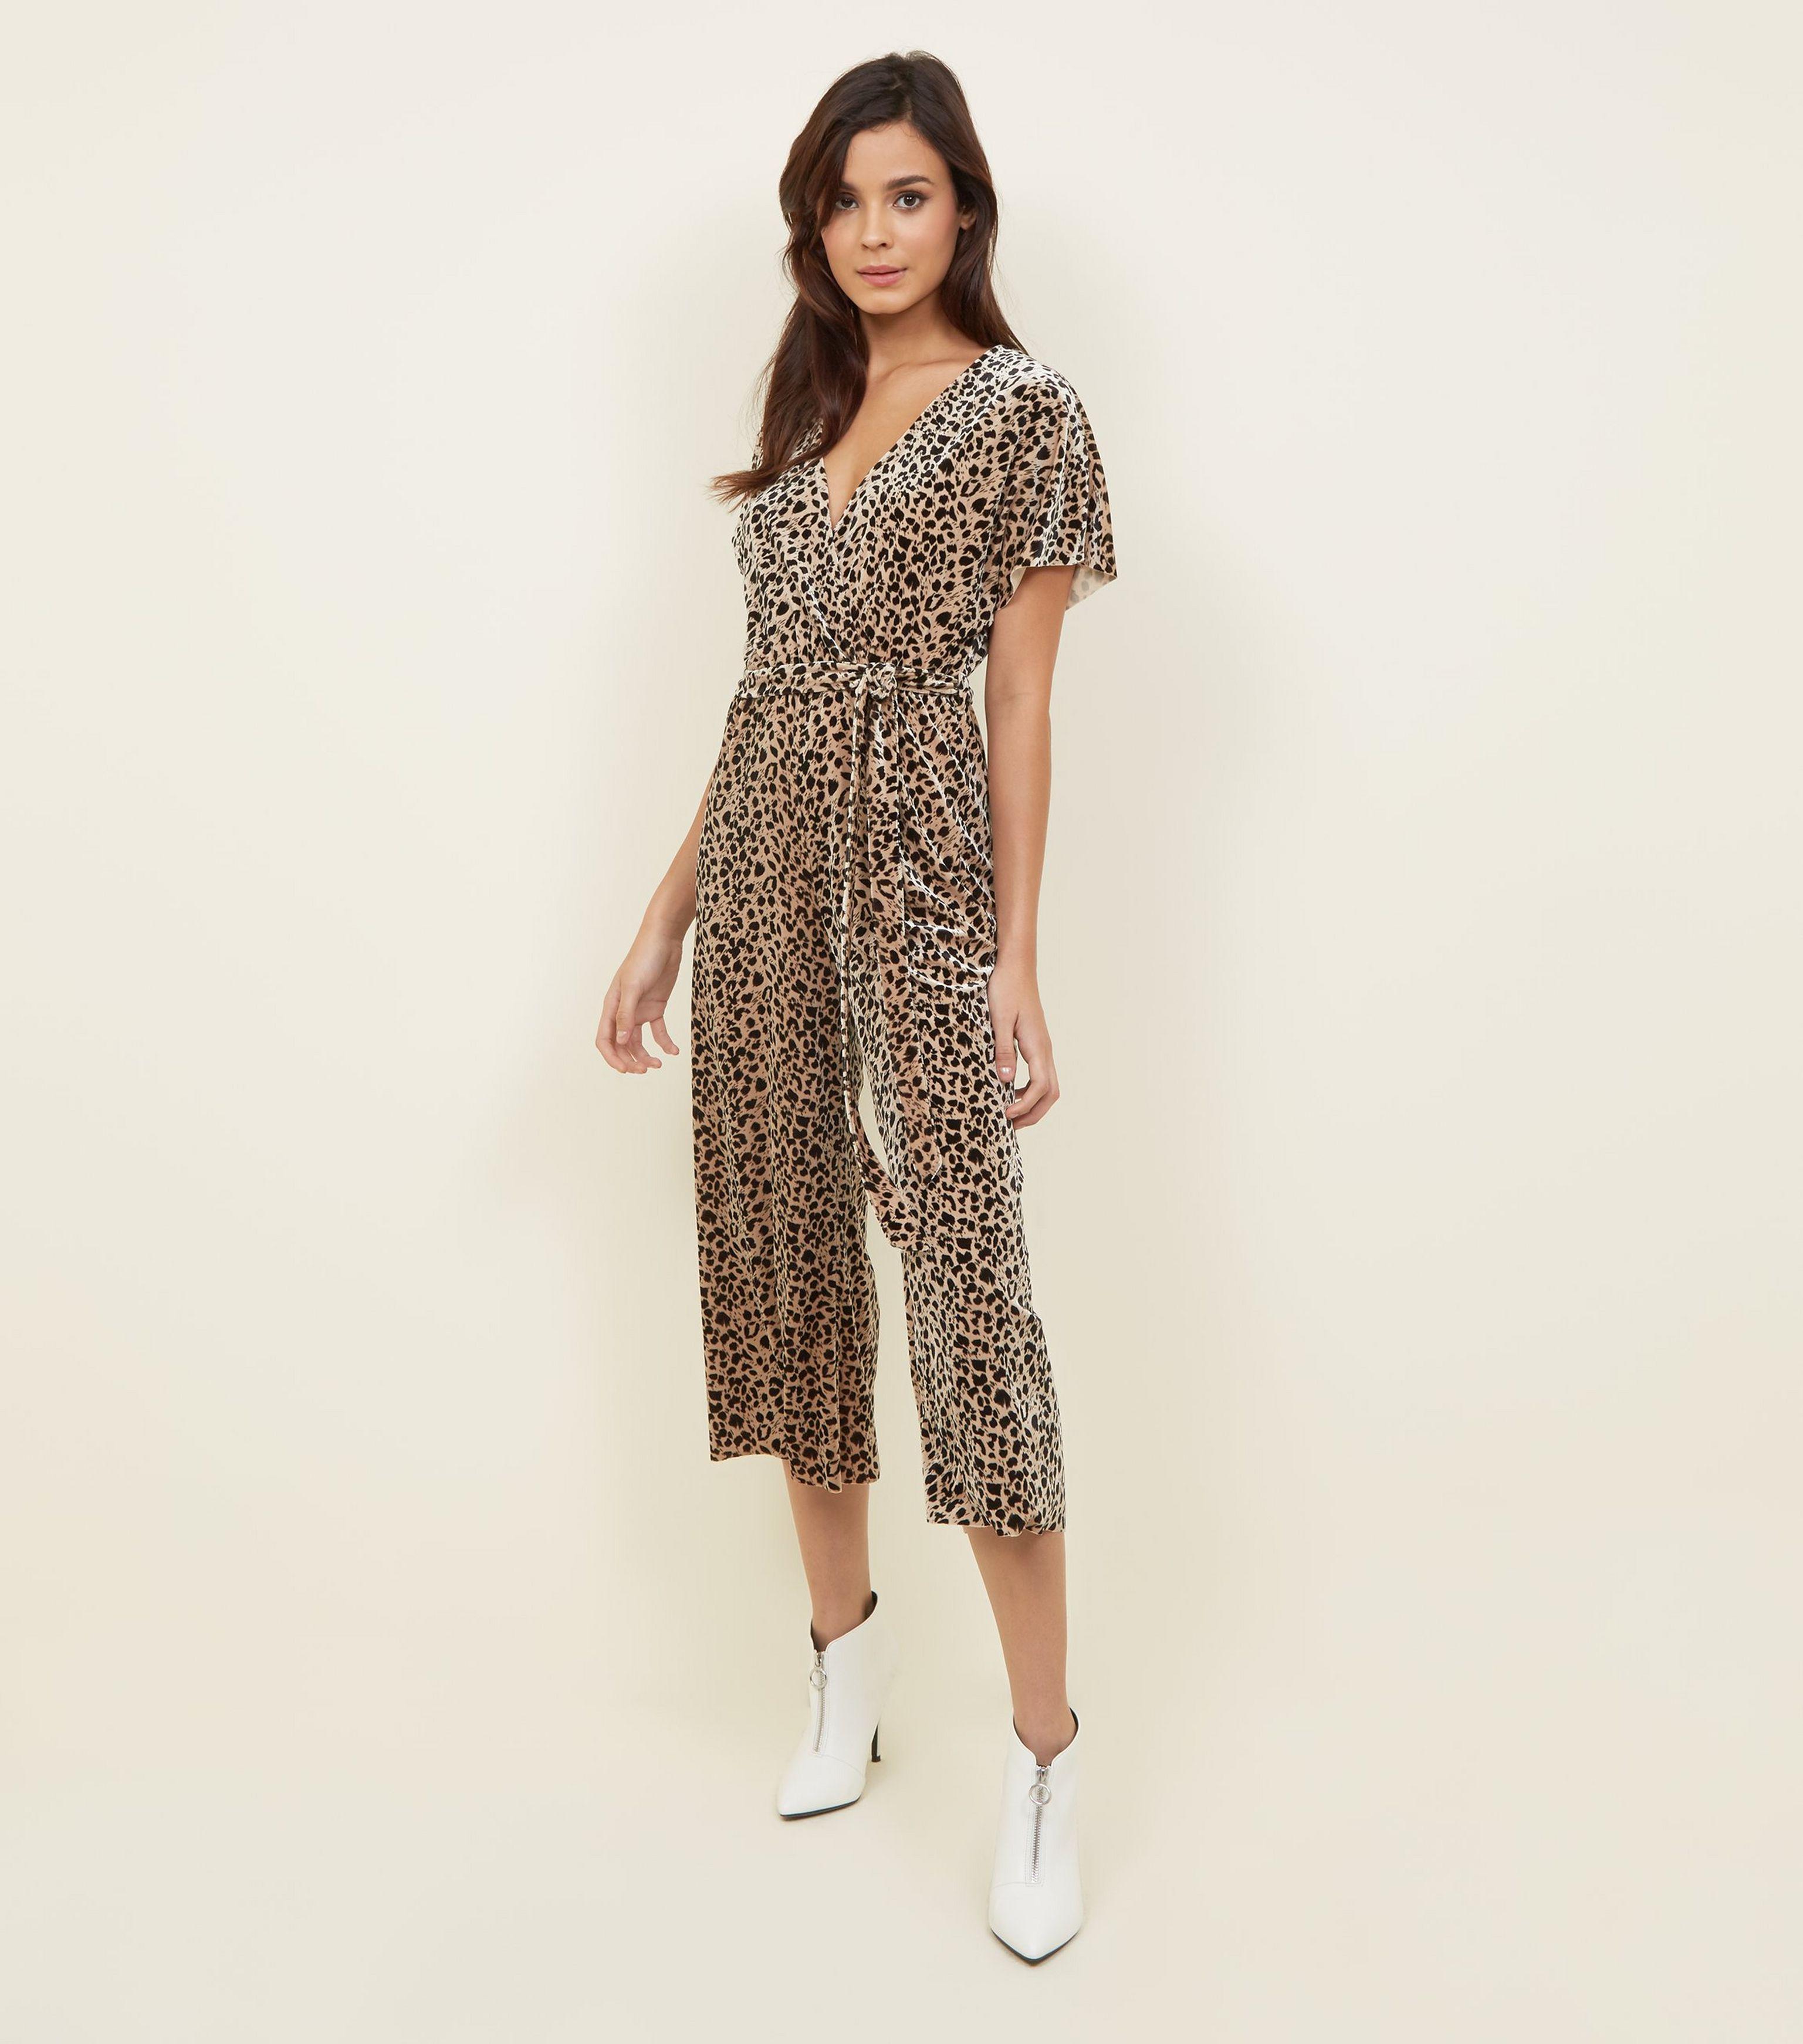 77134eab6107 New Look Brown Leopard Print Velvet Wrap Front Jumpsuit in Brown - Lyst